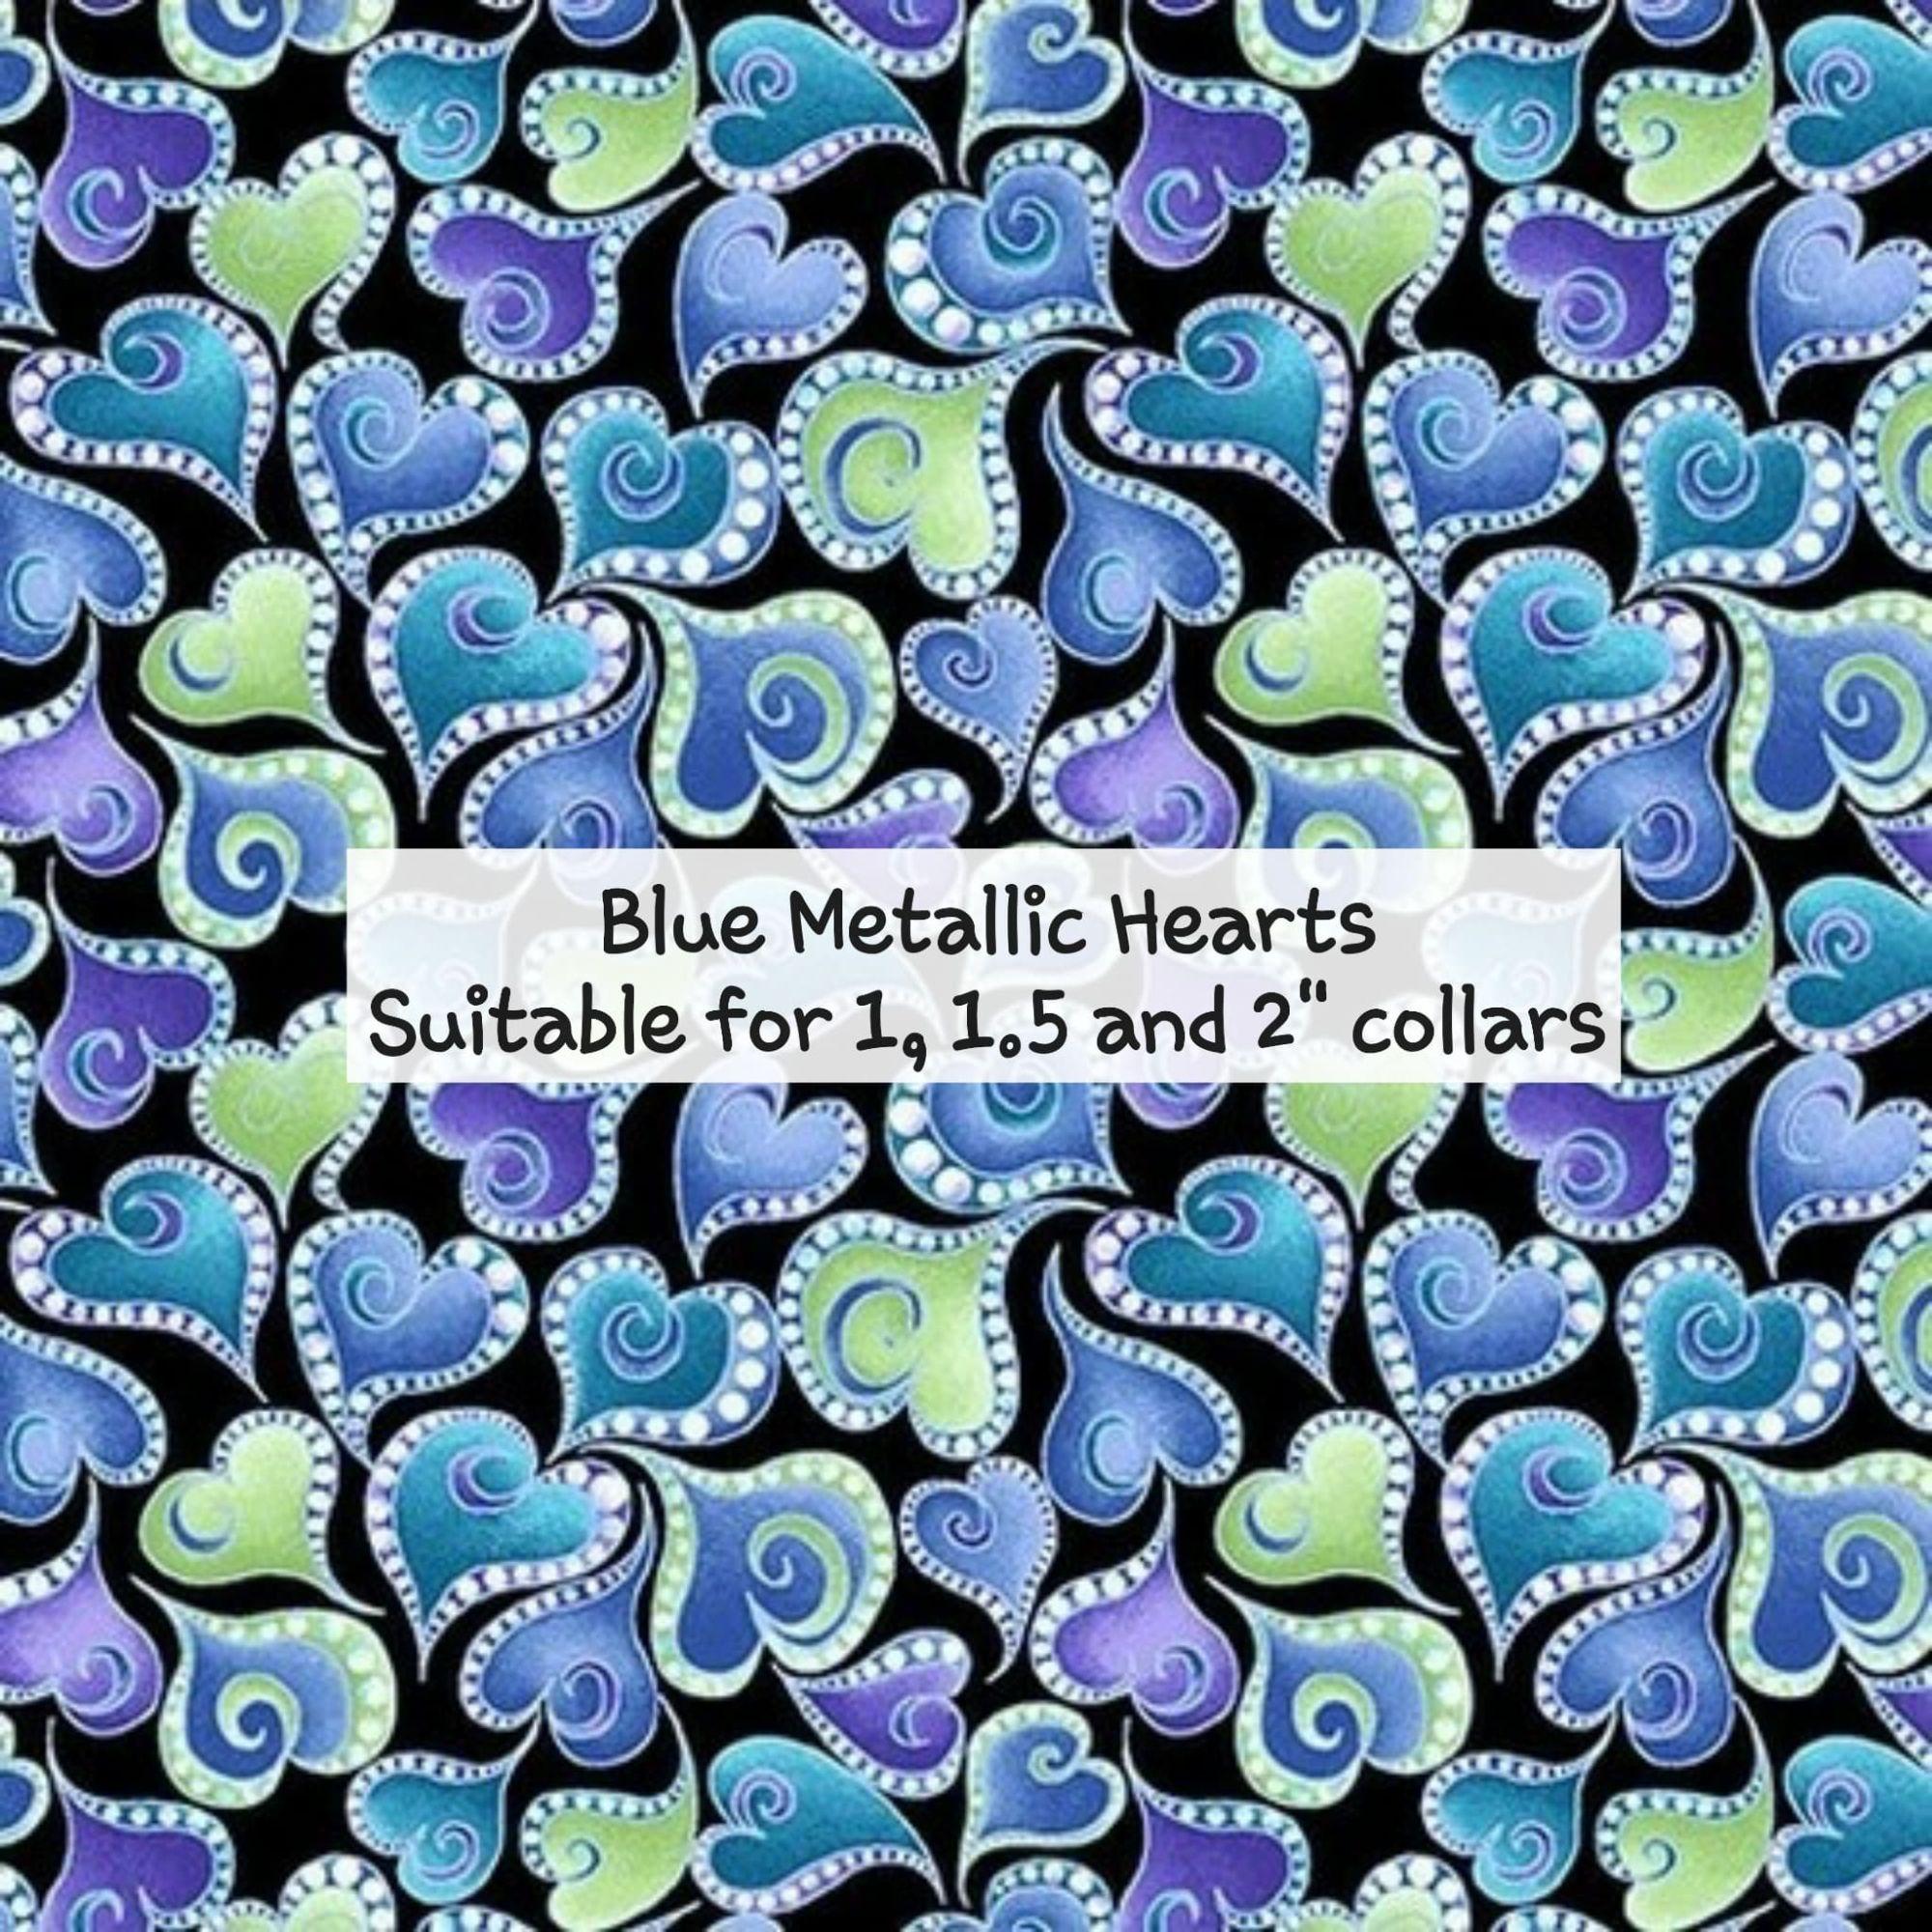 Blue Metallic Hearts